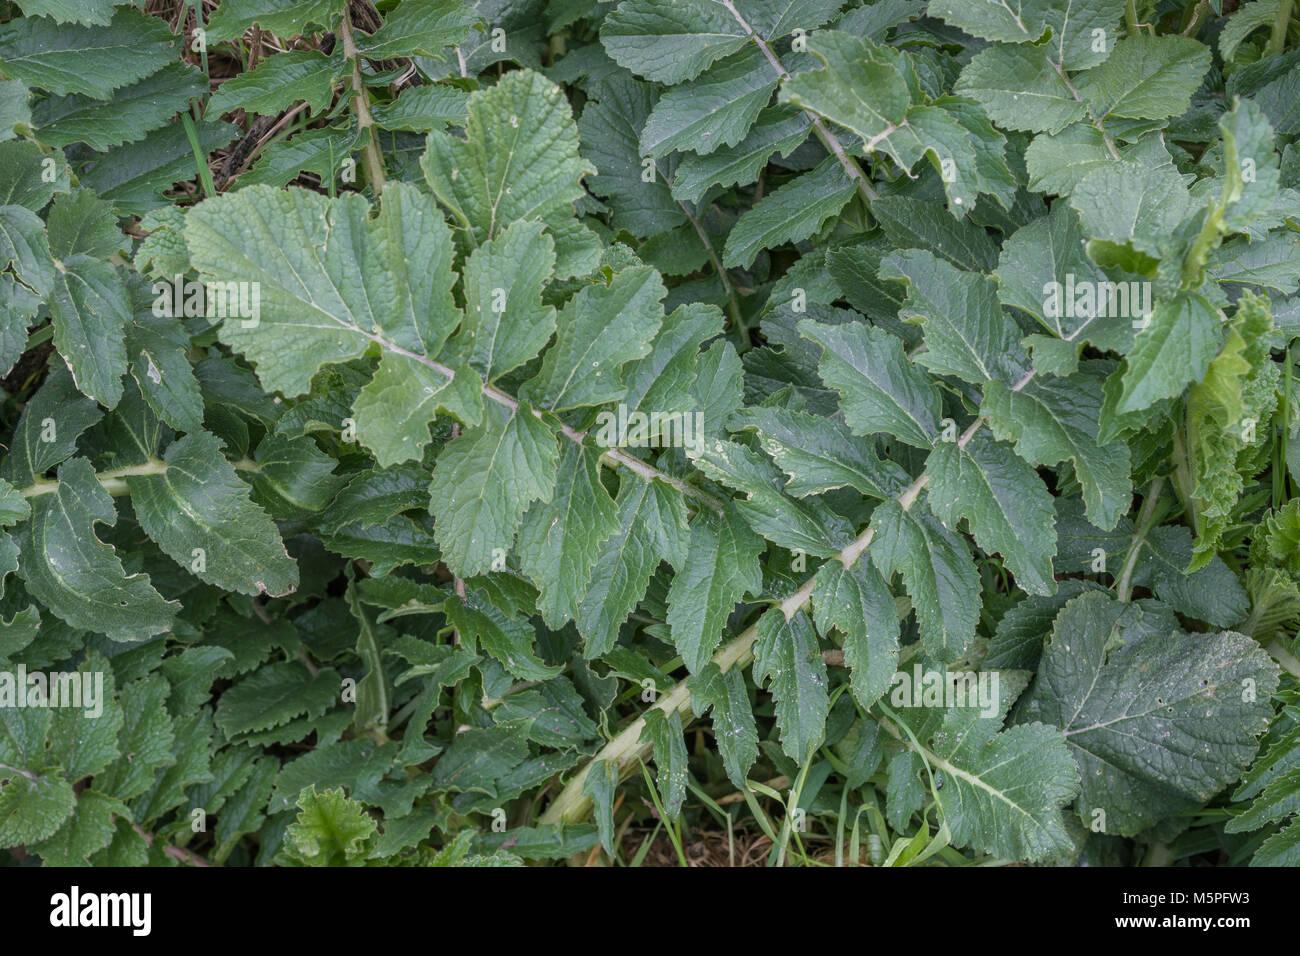 Foliage / leaves of Sea Radish (Cornwall). Foraged leaves have a radishy taste milder than domesticated radish. - Stock Image